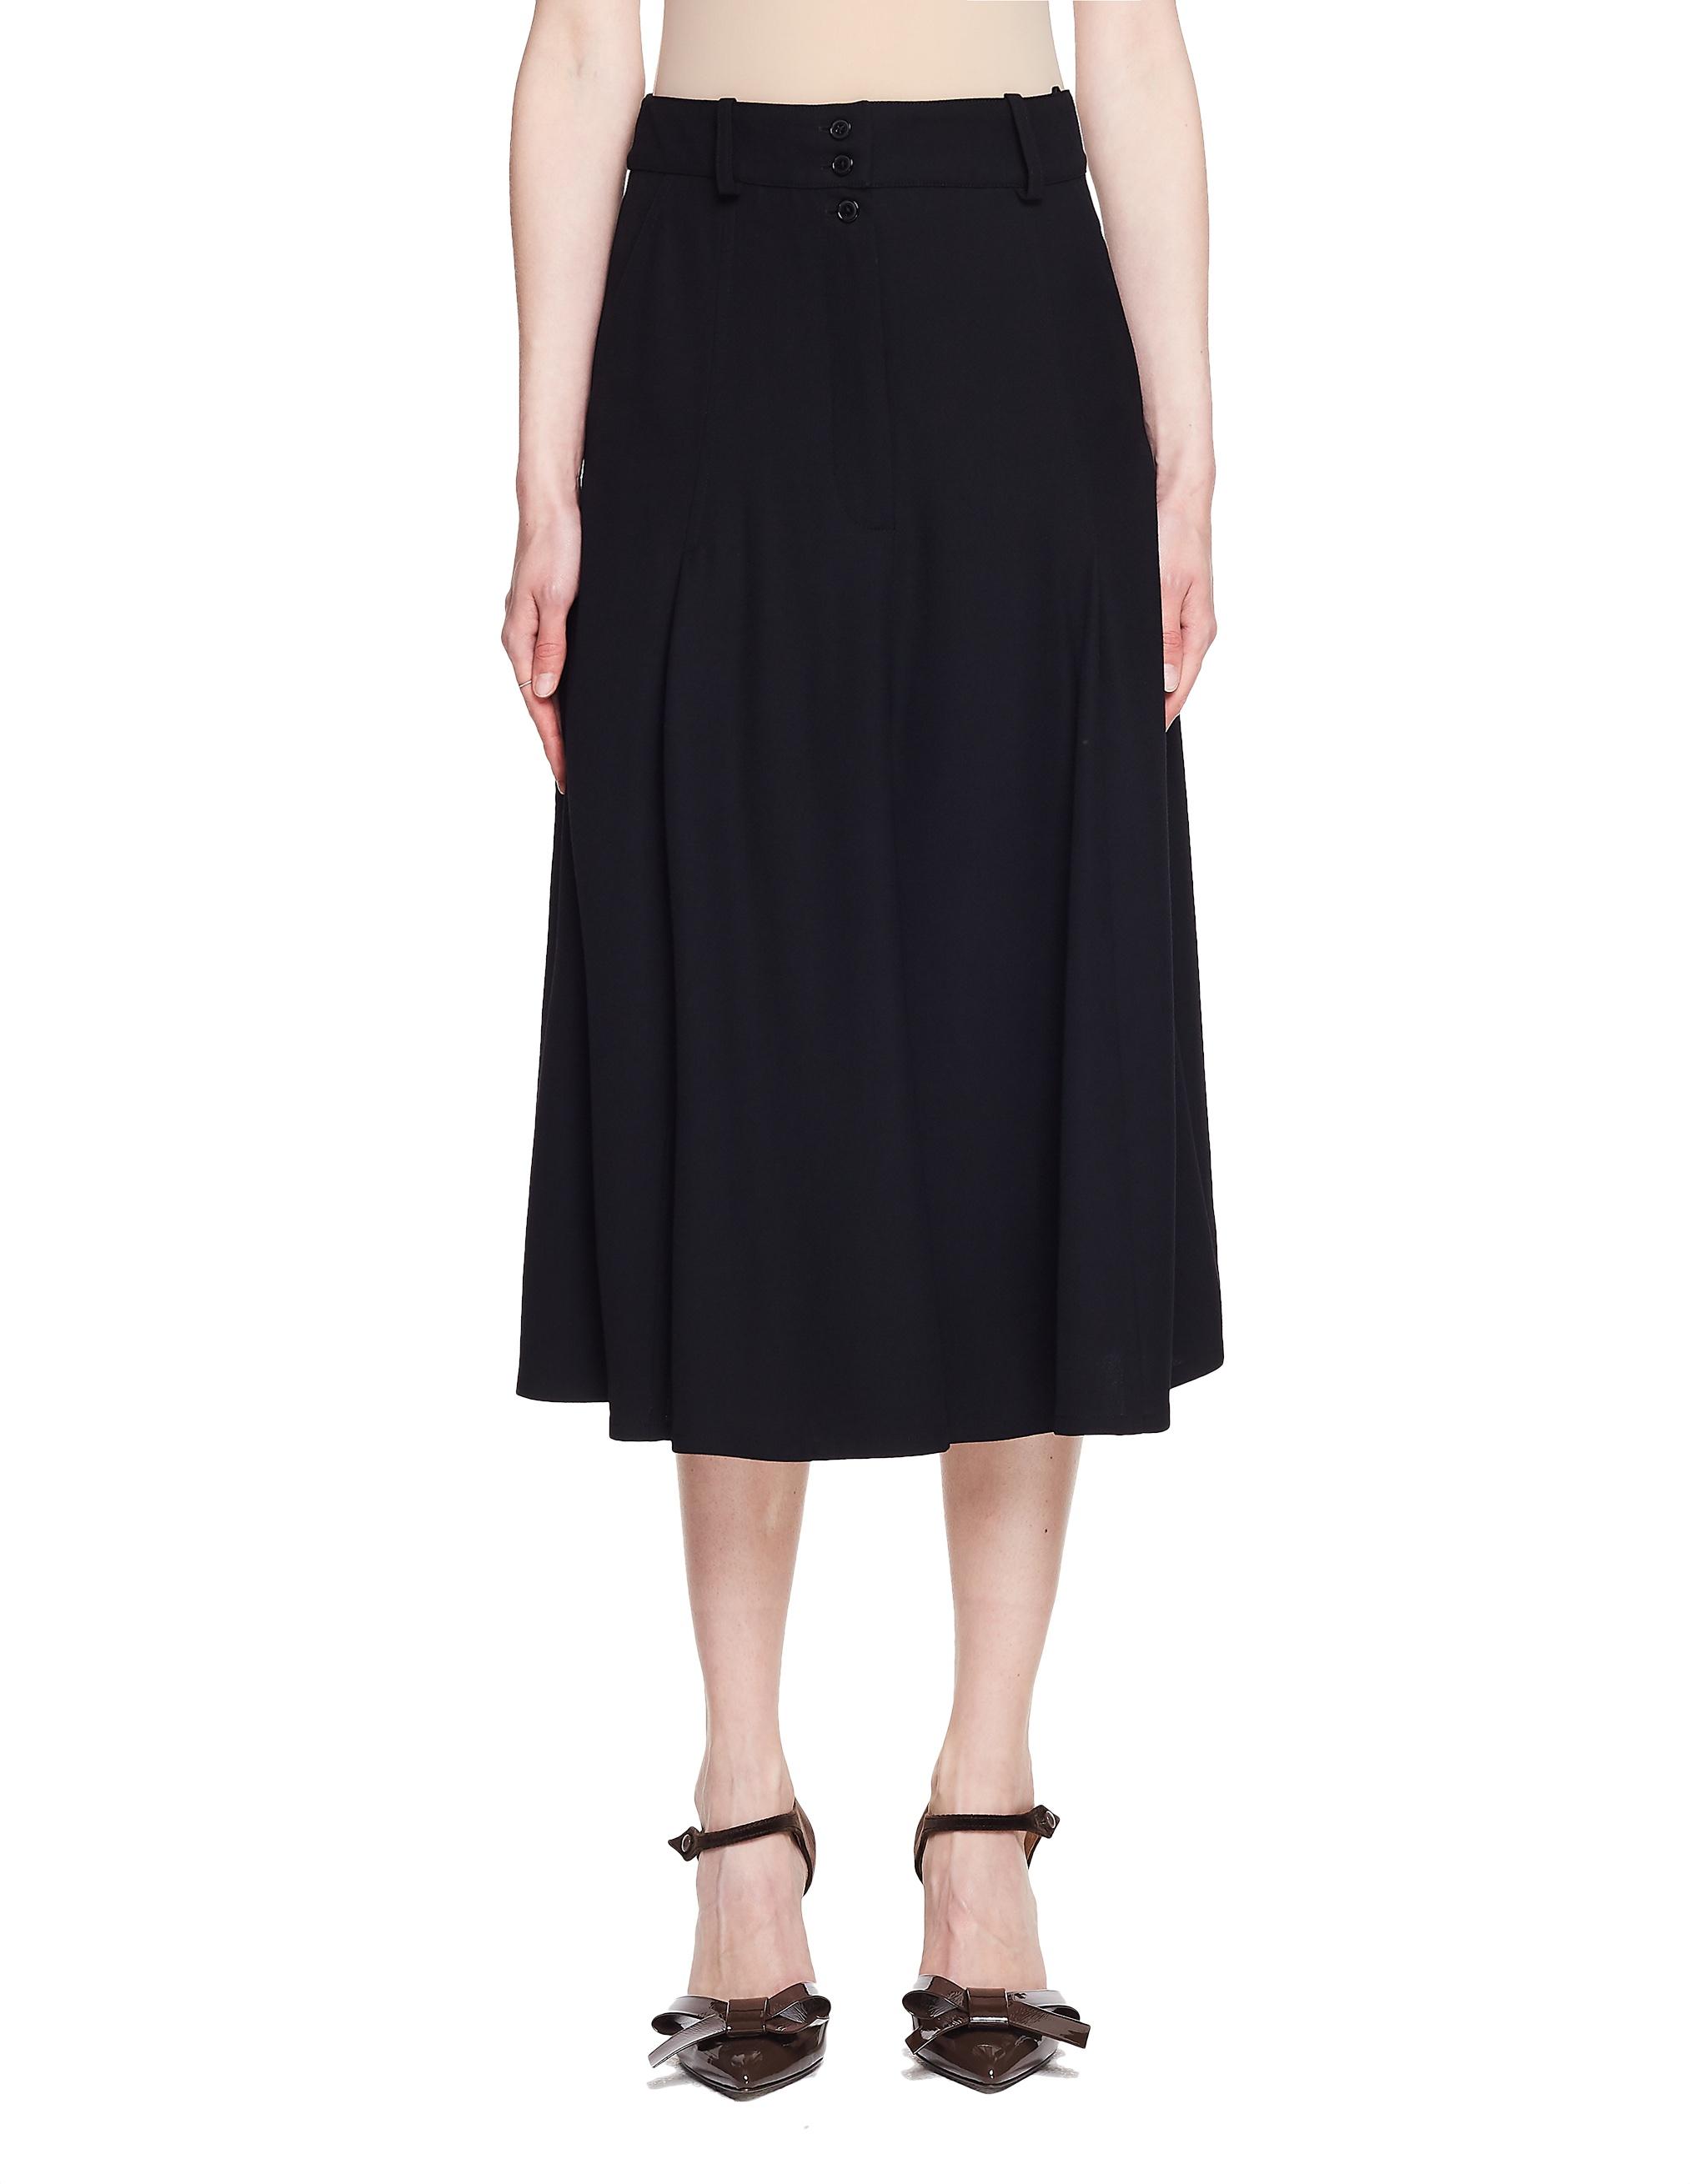 Vetements Black Midi Skirt